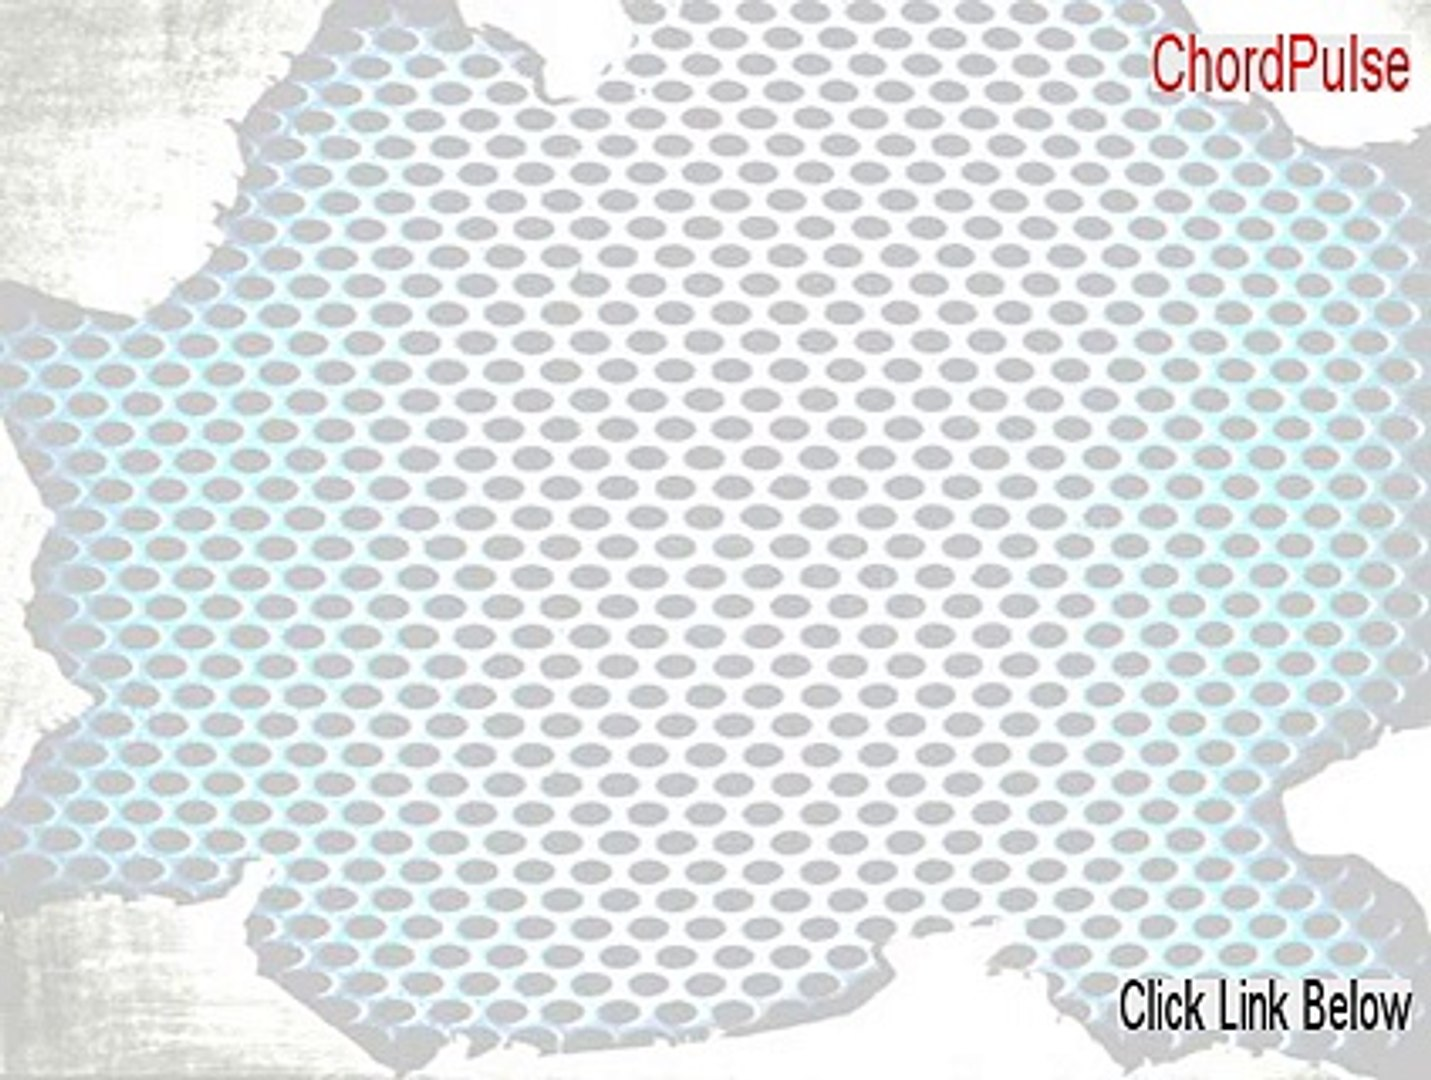 ChordPulse Key Gen - Legit Download (2015)